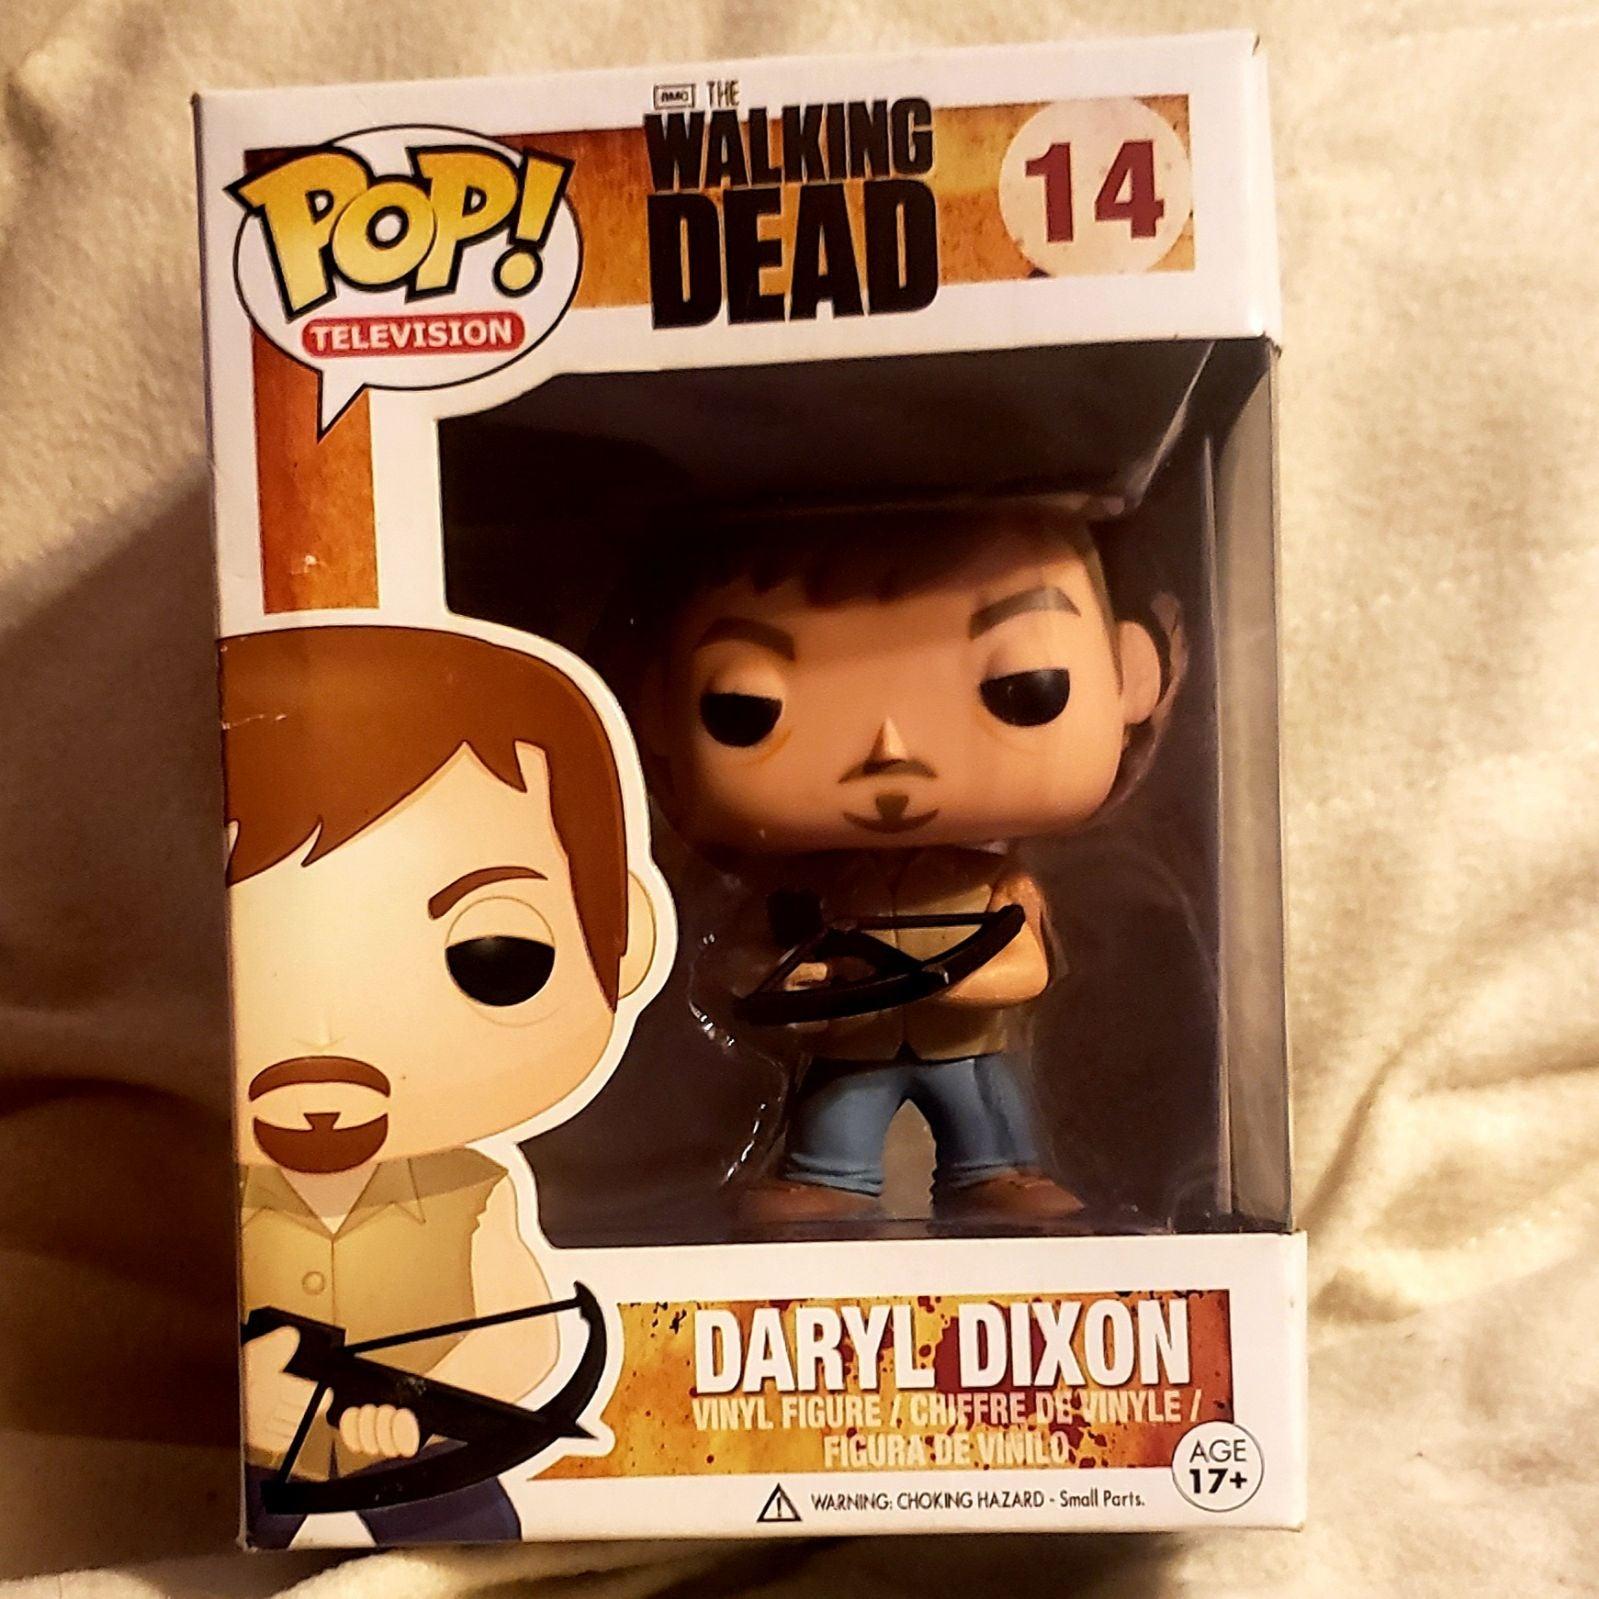 The Walking Dead Daryl Dixon Funko Pop